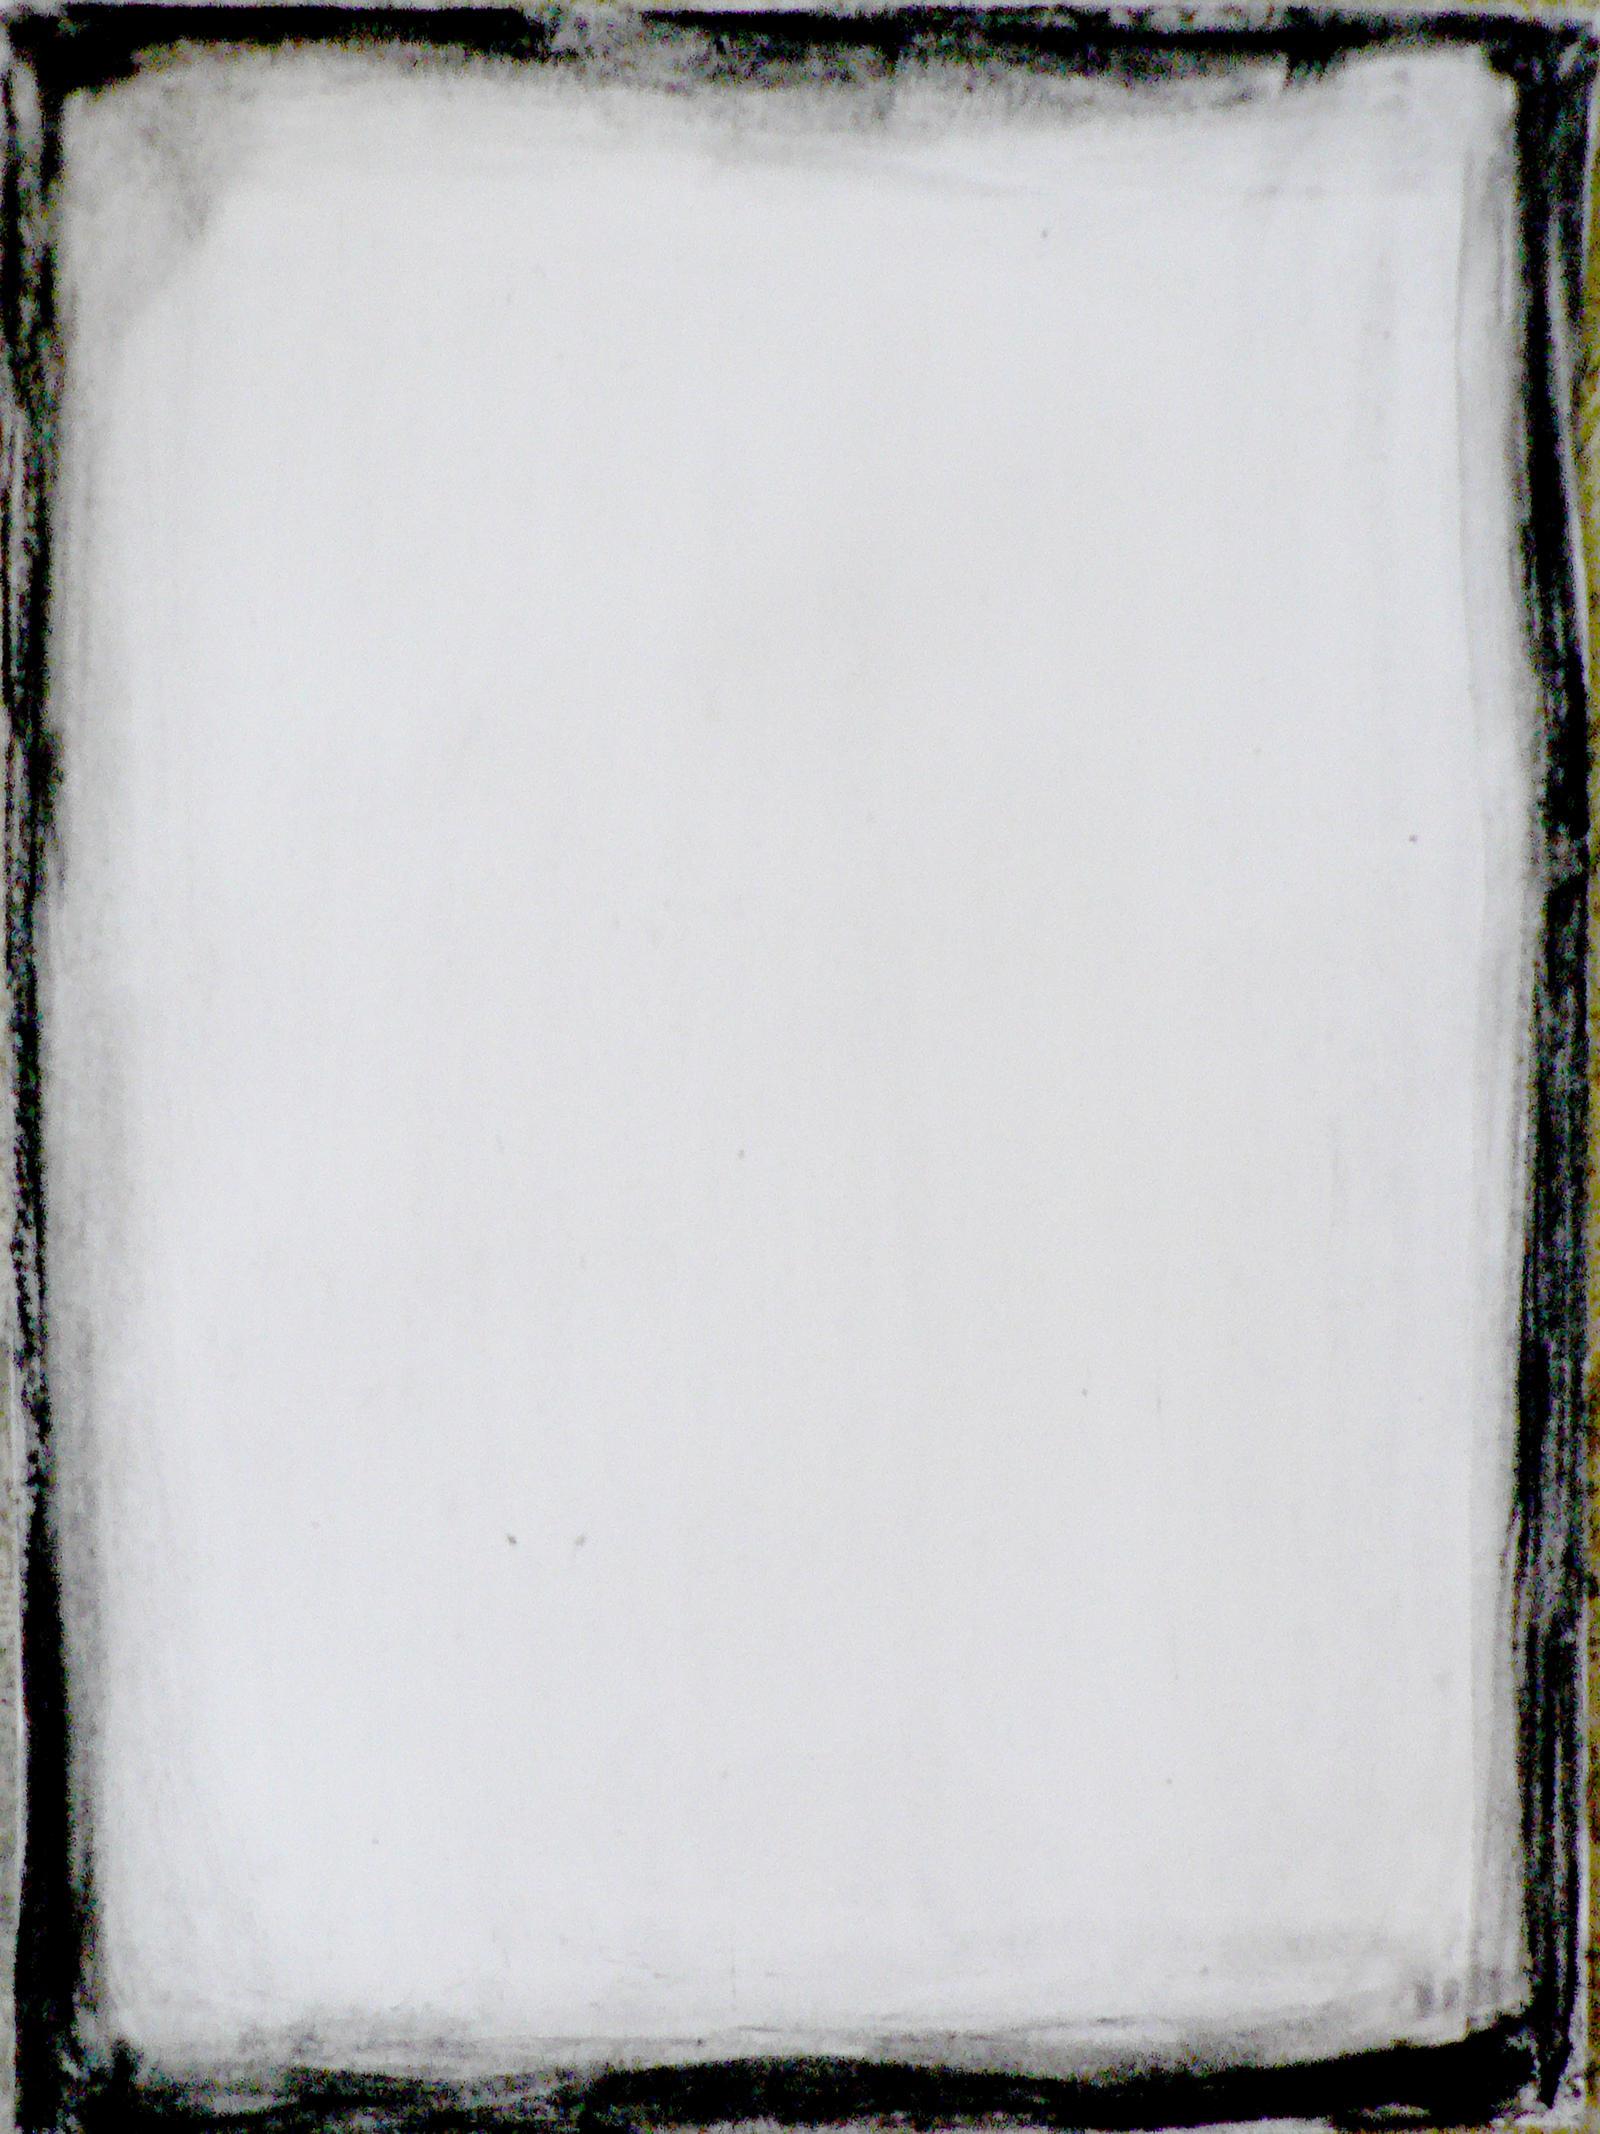 Frame 2 by natdiastock